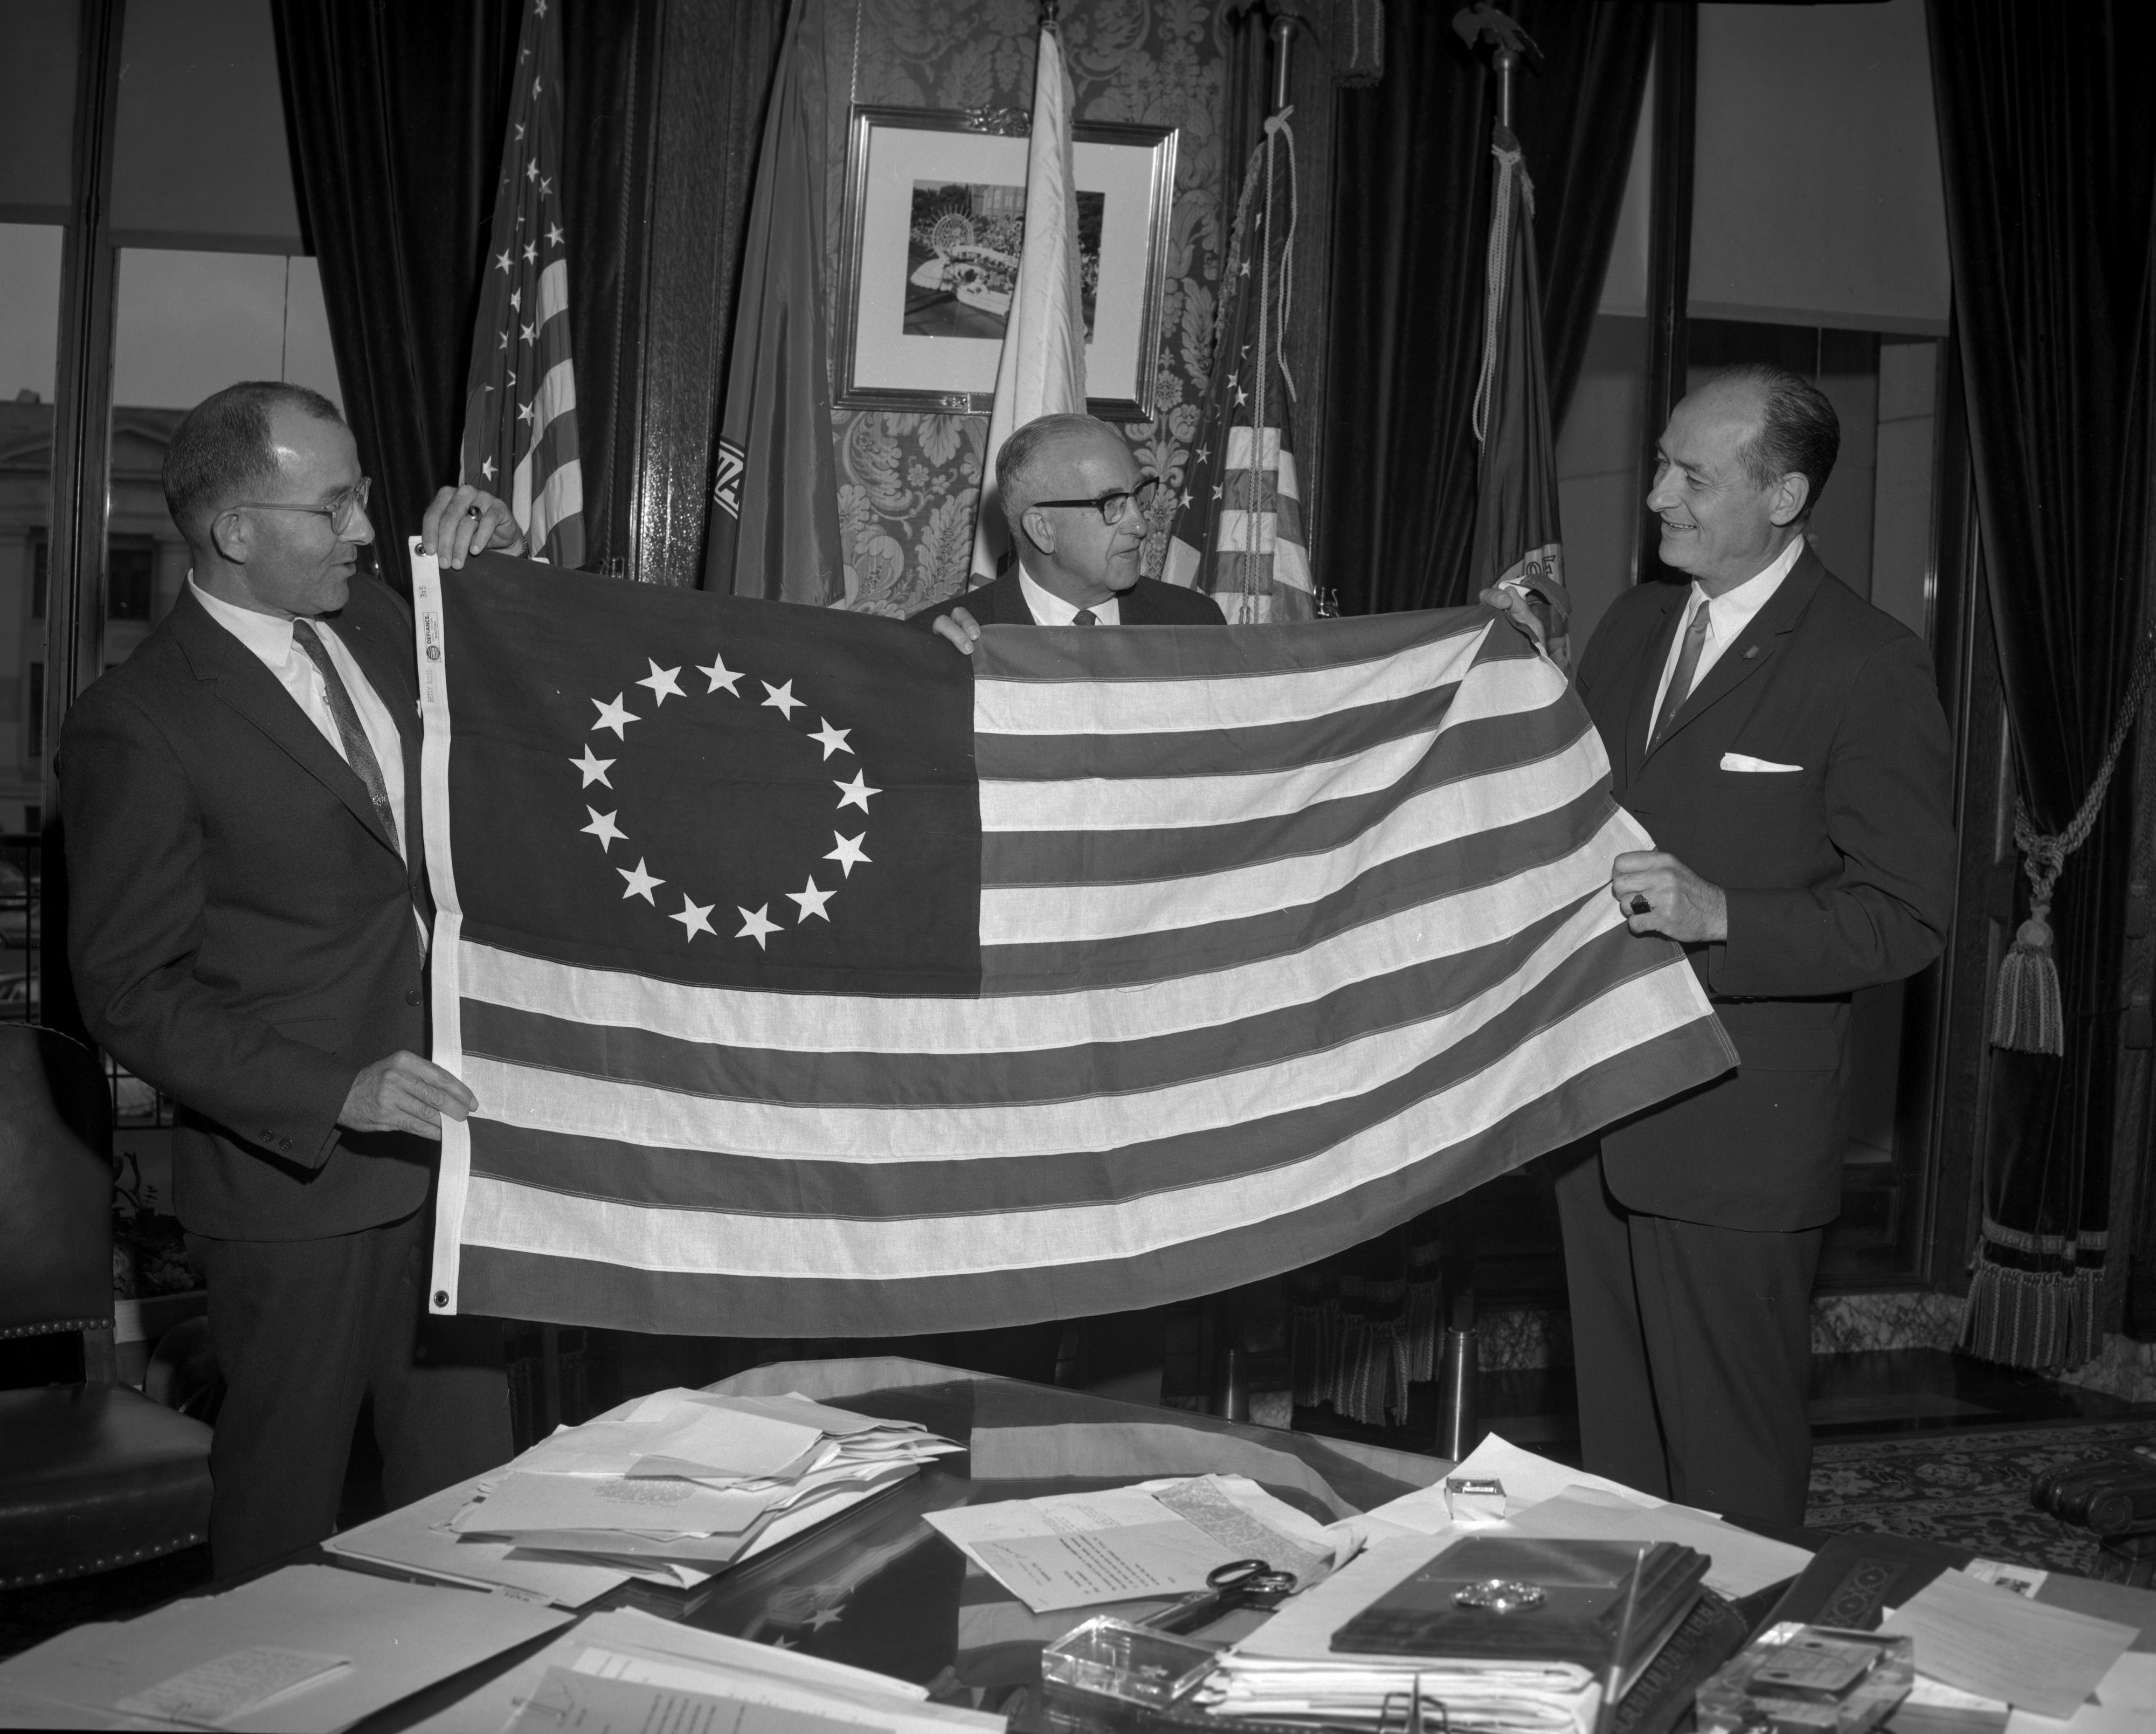 historical U.S. Flag